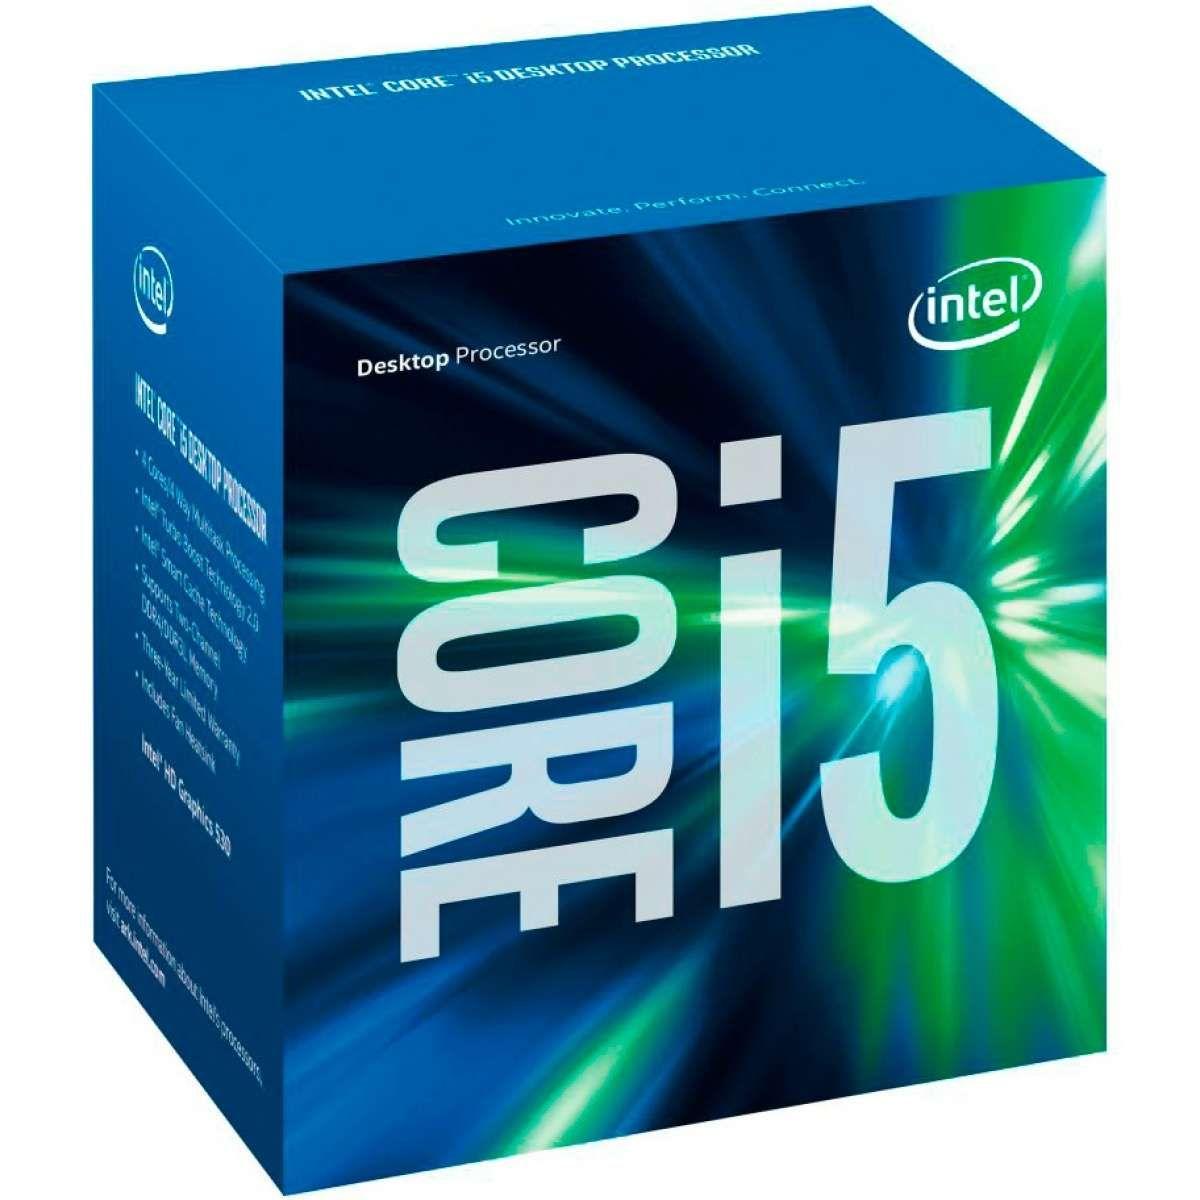 Processador Intel Core i5-7400 Kaby Lake 7Ger. 3.0Ghz, 6MB, LGA 1151 - BX80677I57400